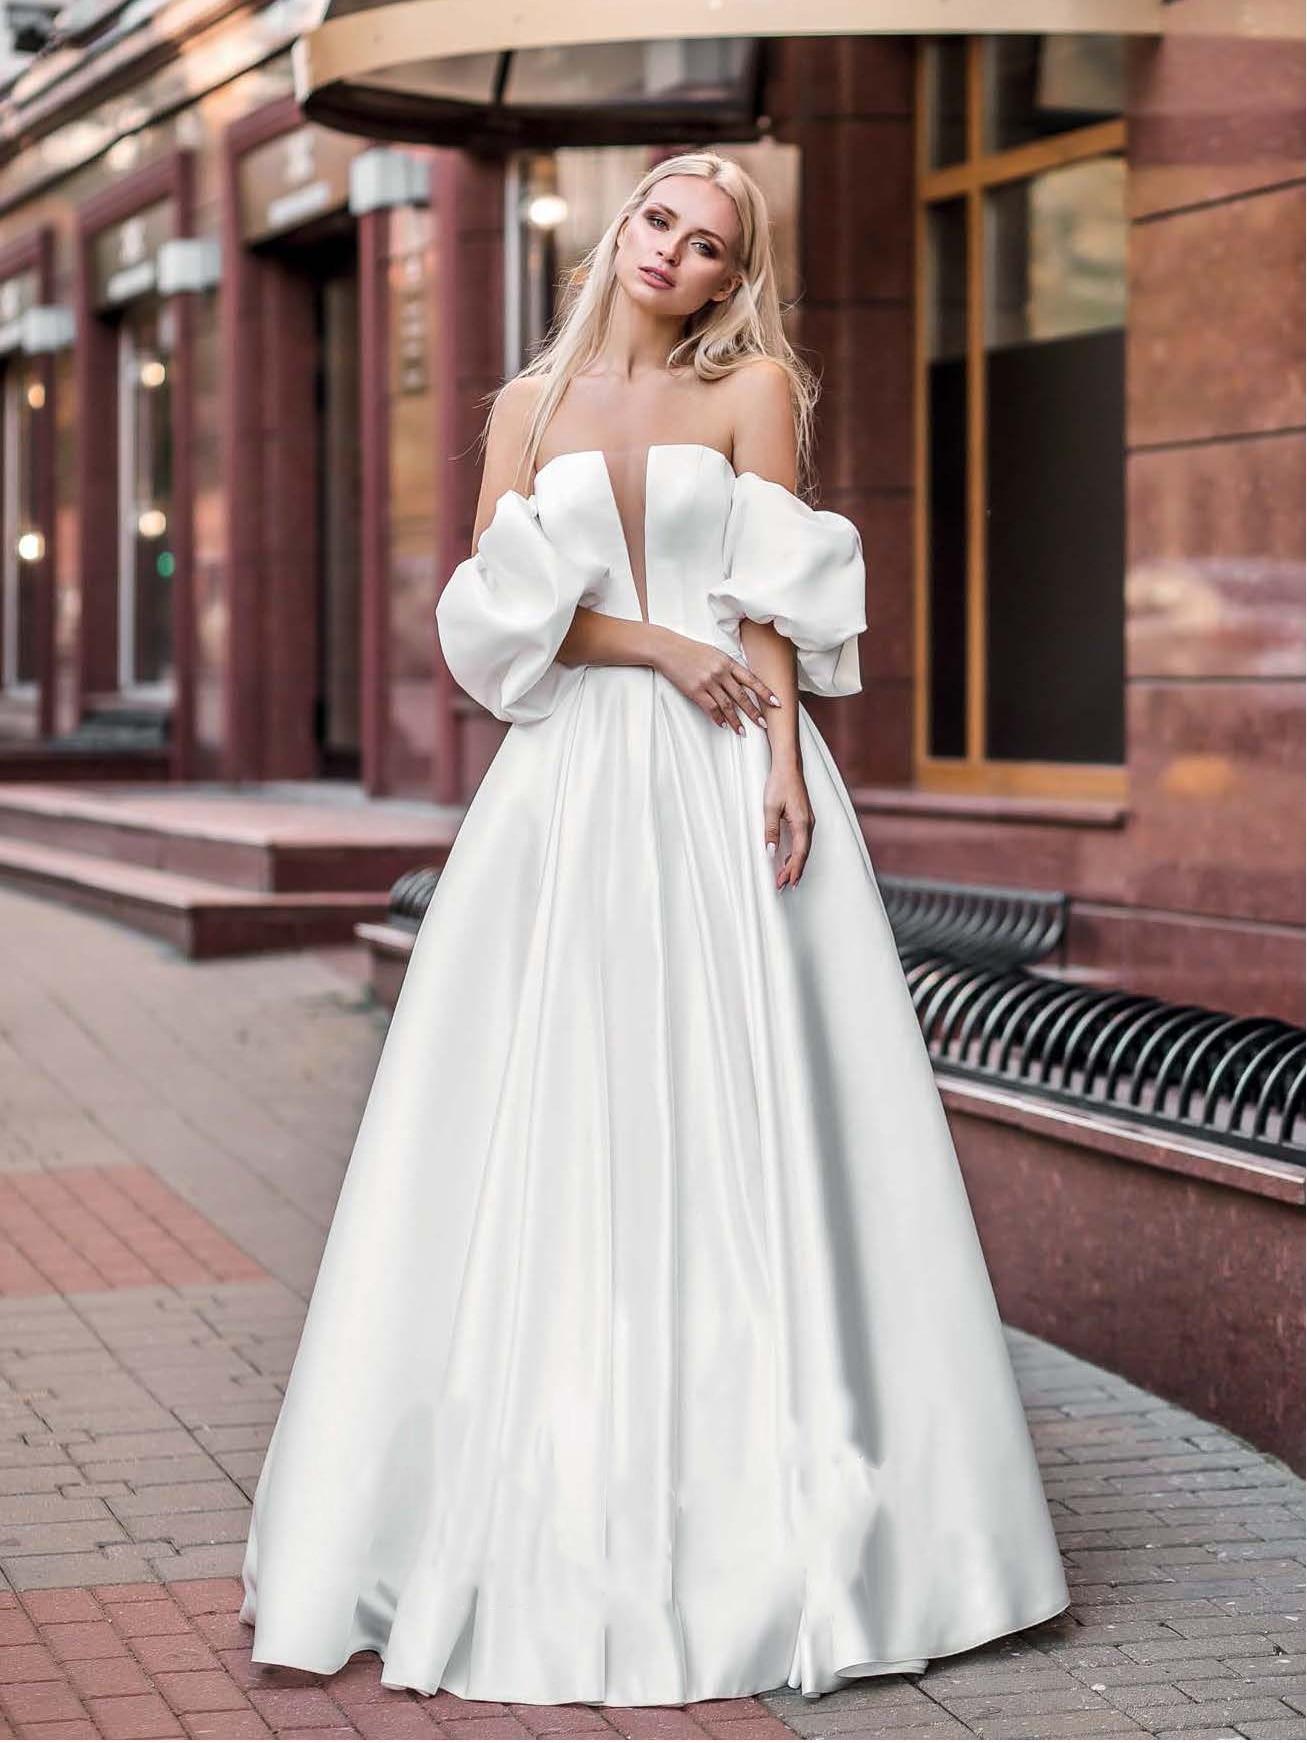 Promo Strapless Satin Wedding Bridesmaid Gowns V-Neck Custom Made 2021 Short Sleeves Lacing Princess Simple Full Length Bridal Dress